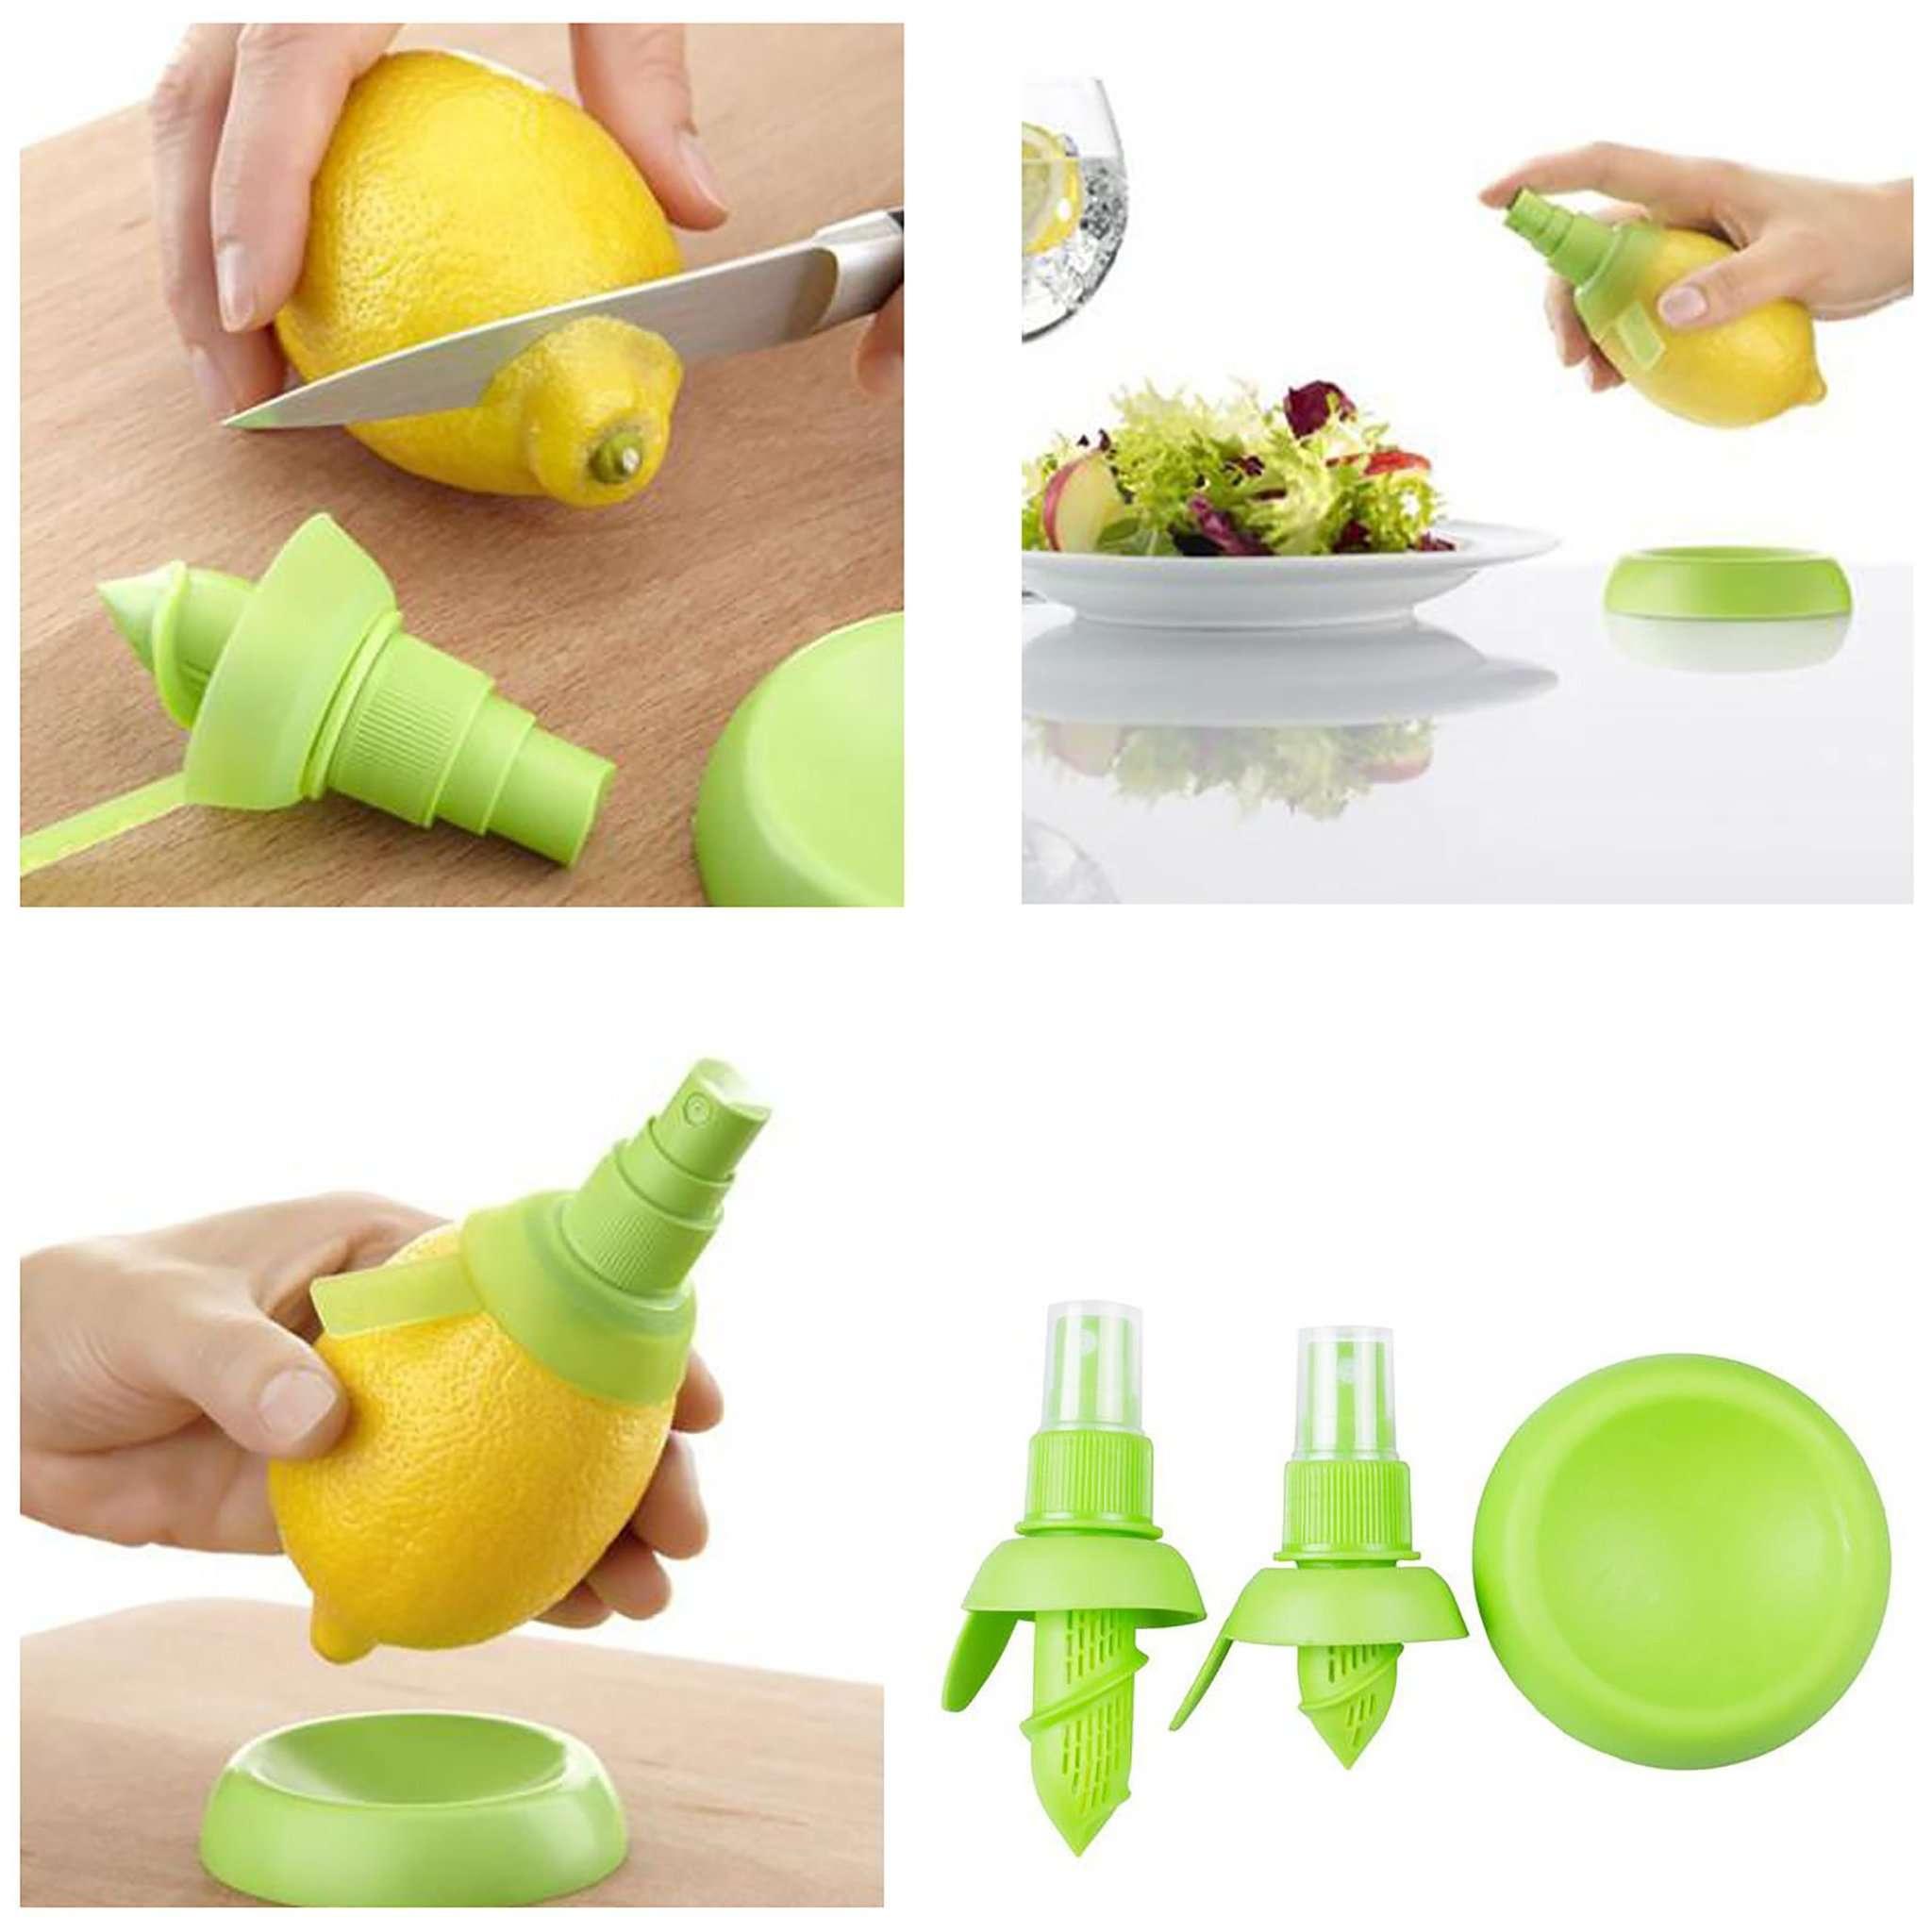 New Quirky Citrus Silicone Plastic Nozzle Spray Stem Juice Sprayer Yellow/Green